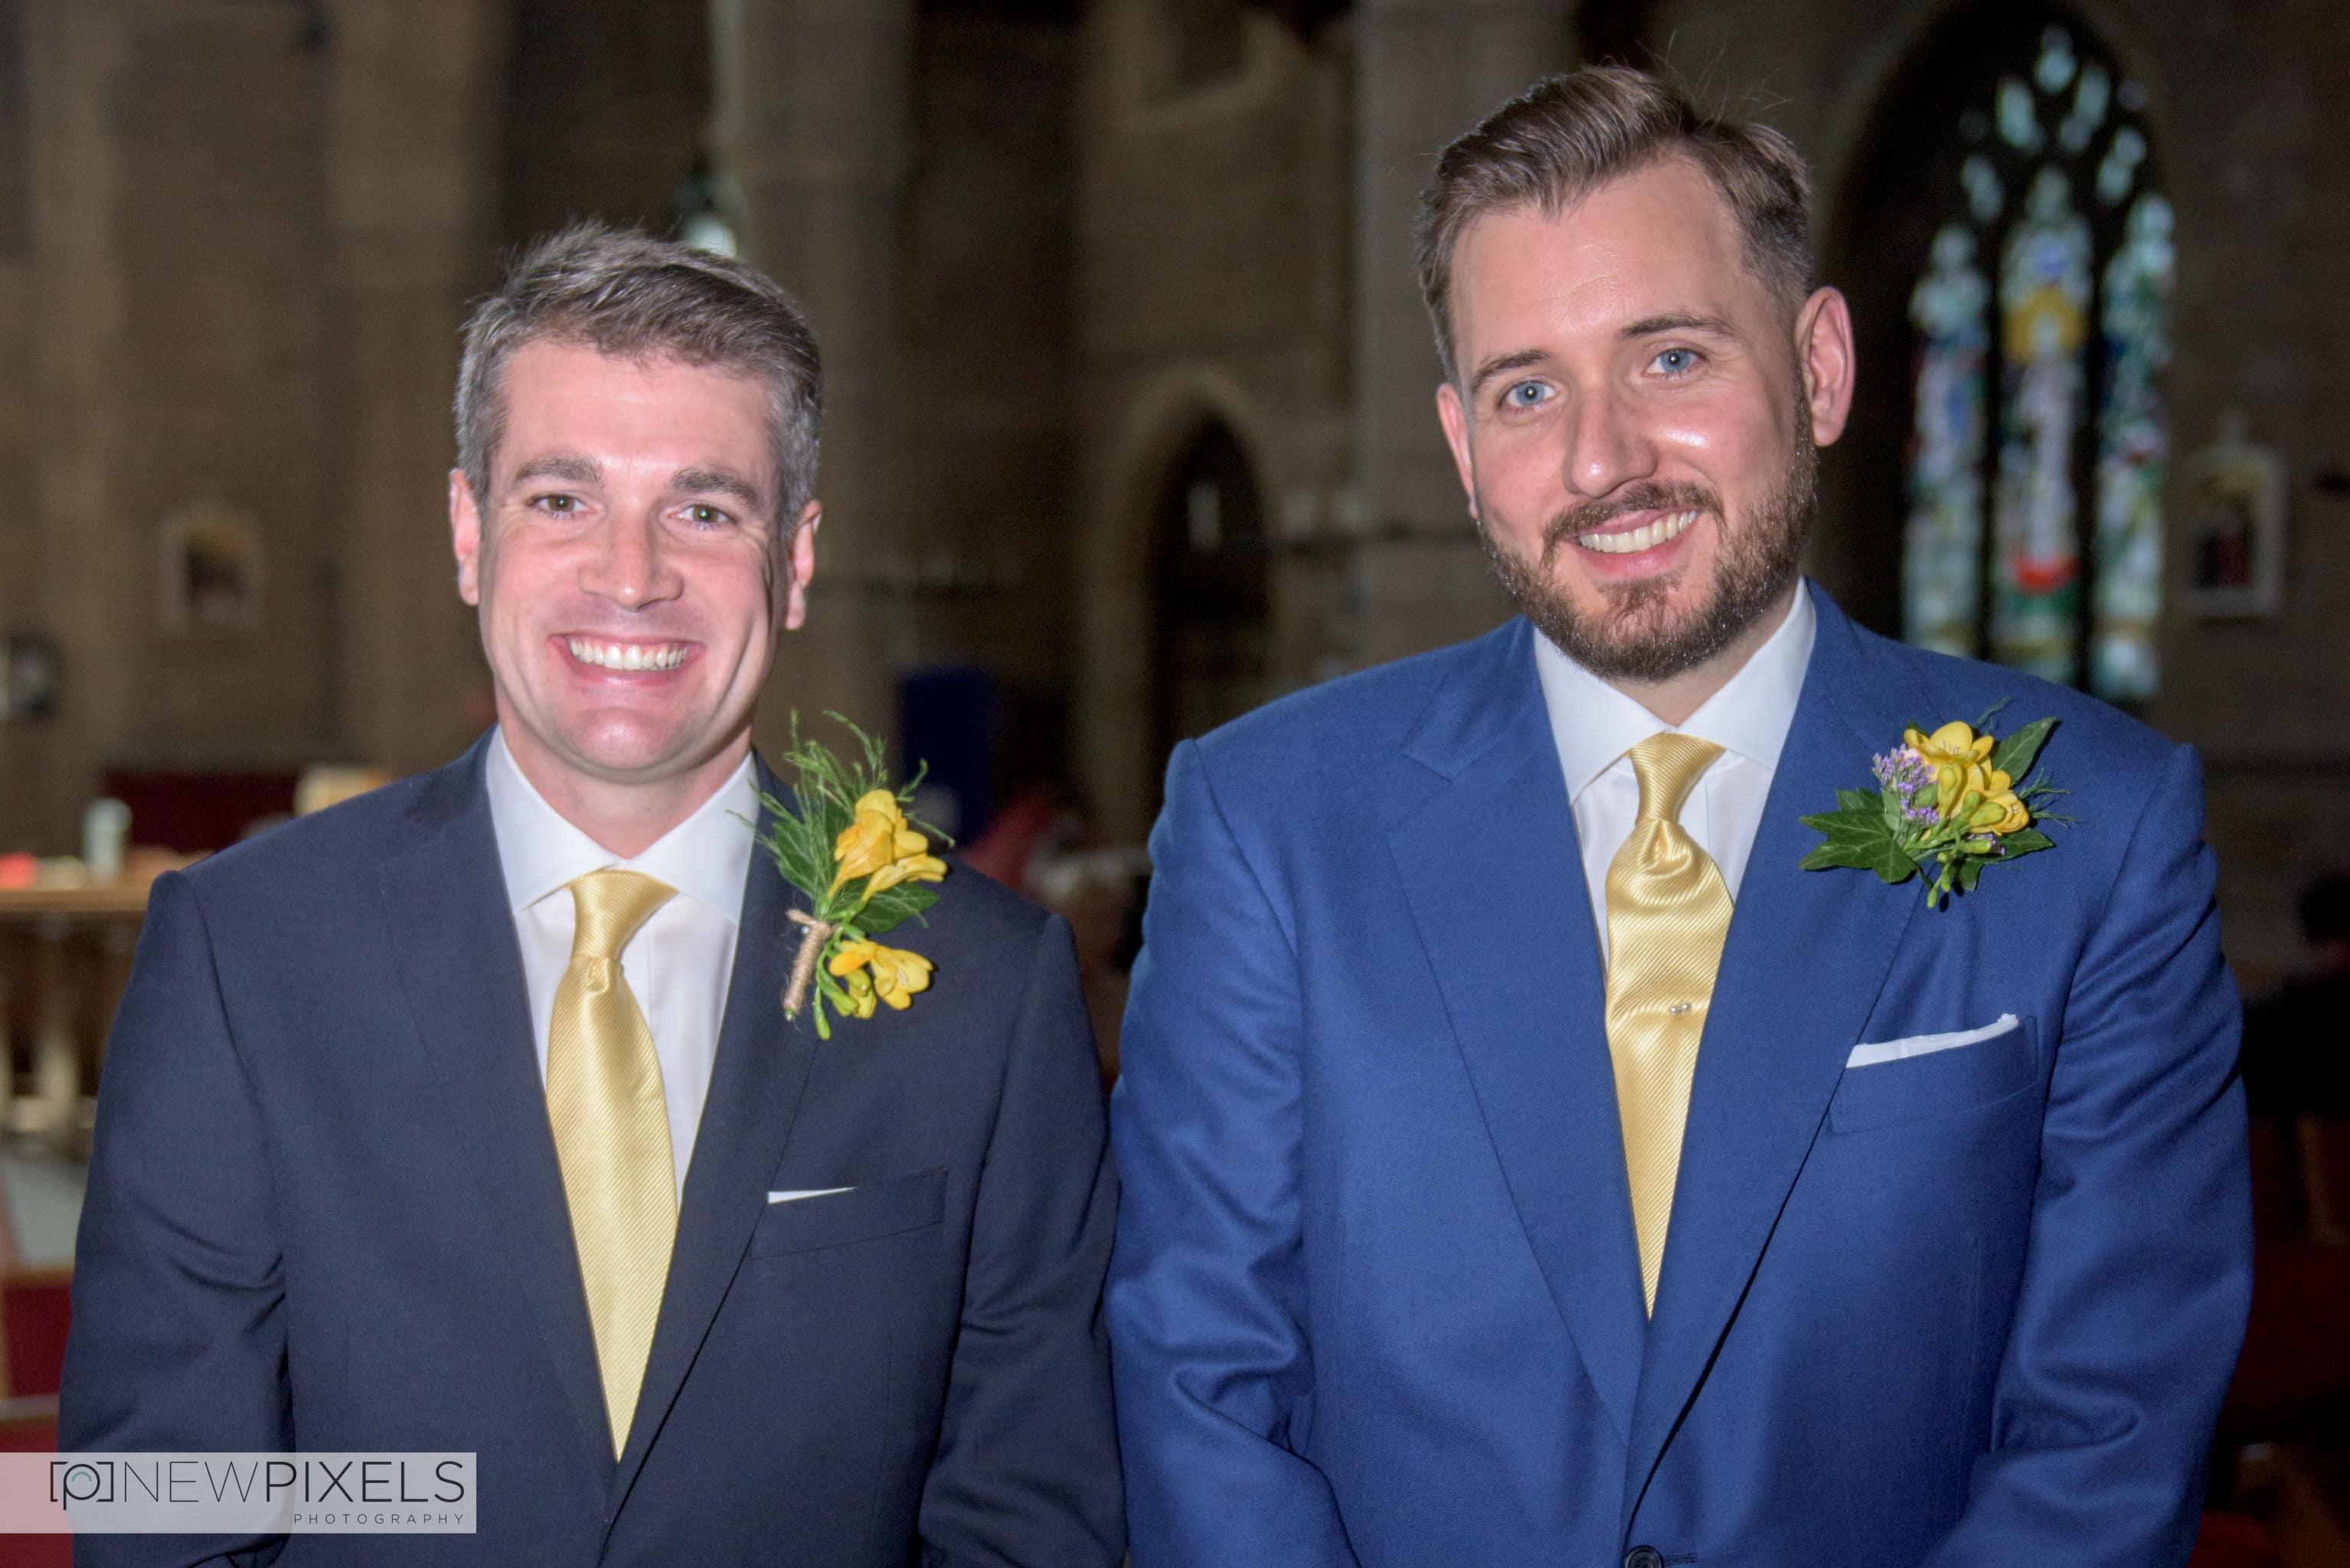 Enfield Wedding Photography- New Pixels-20